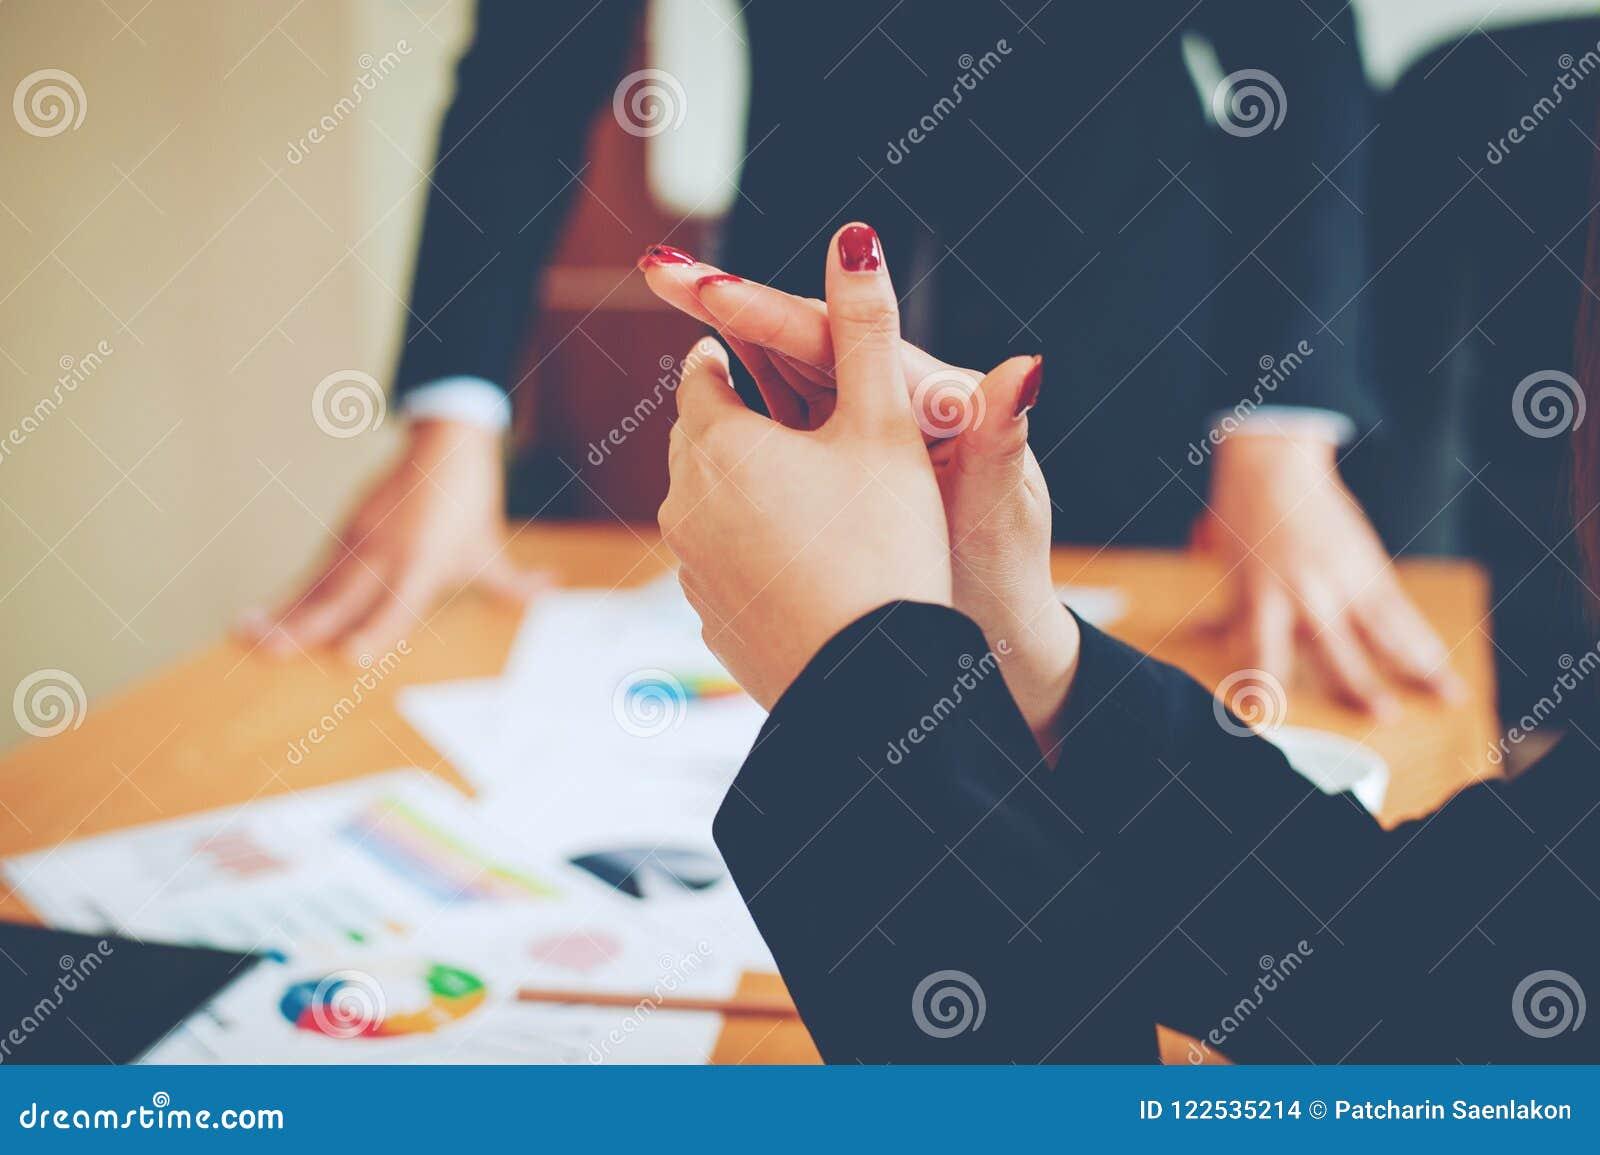 office@hand meetings download